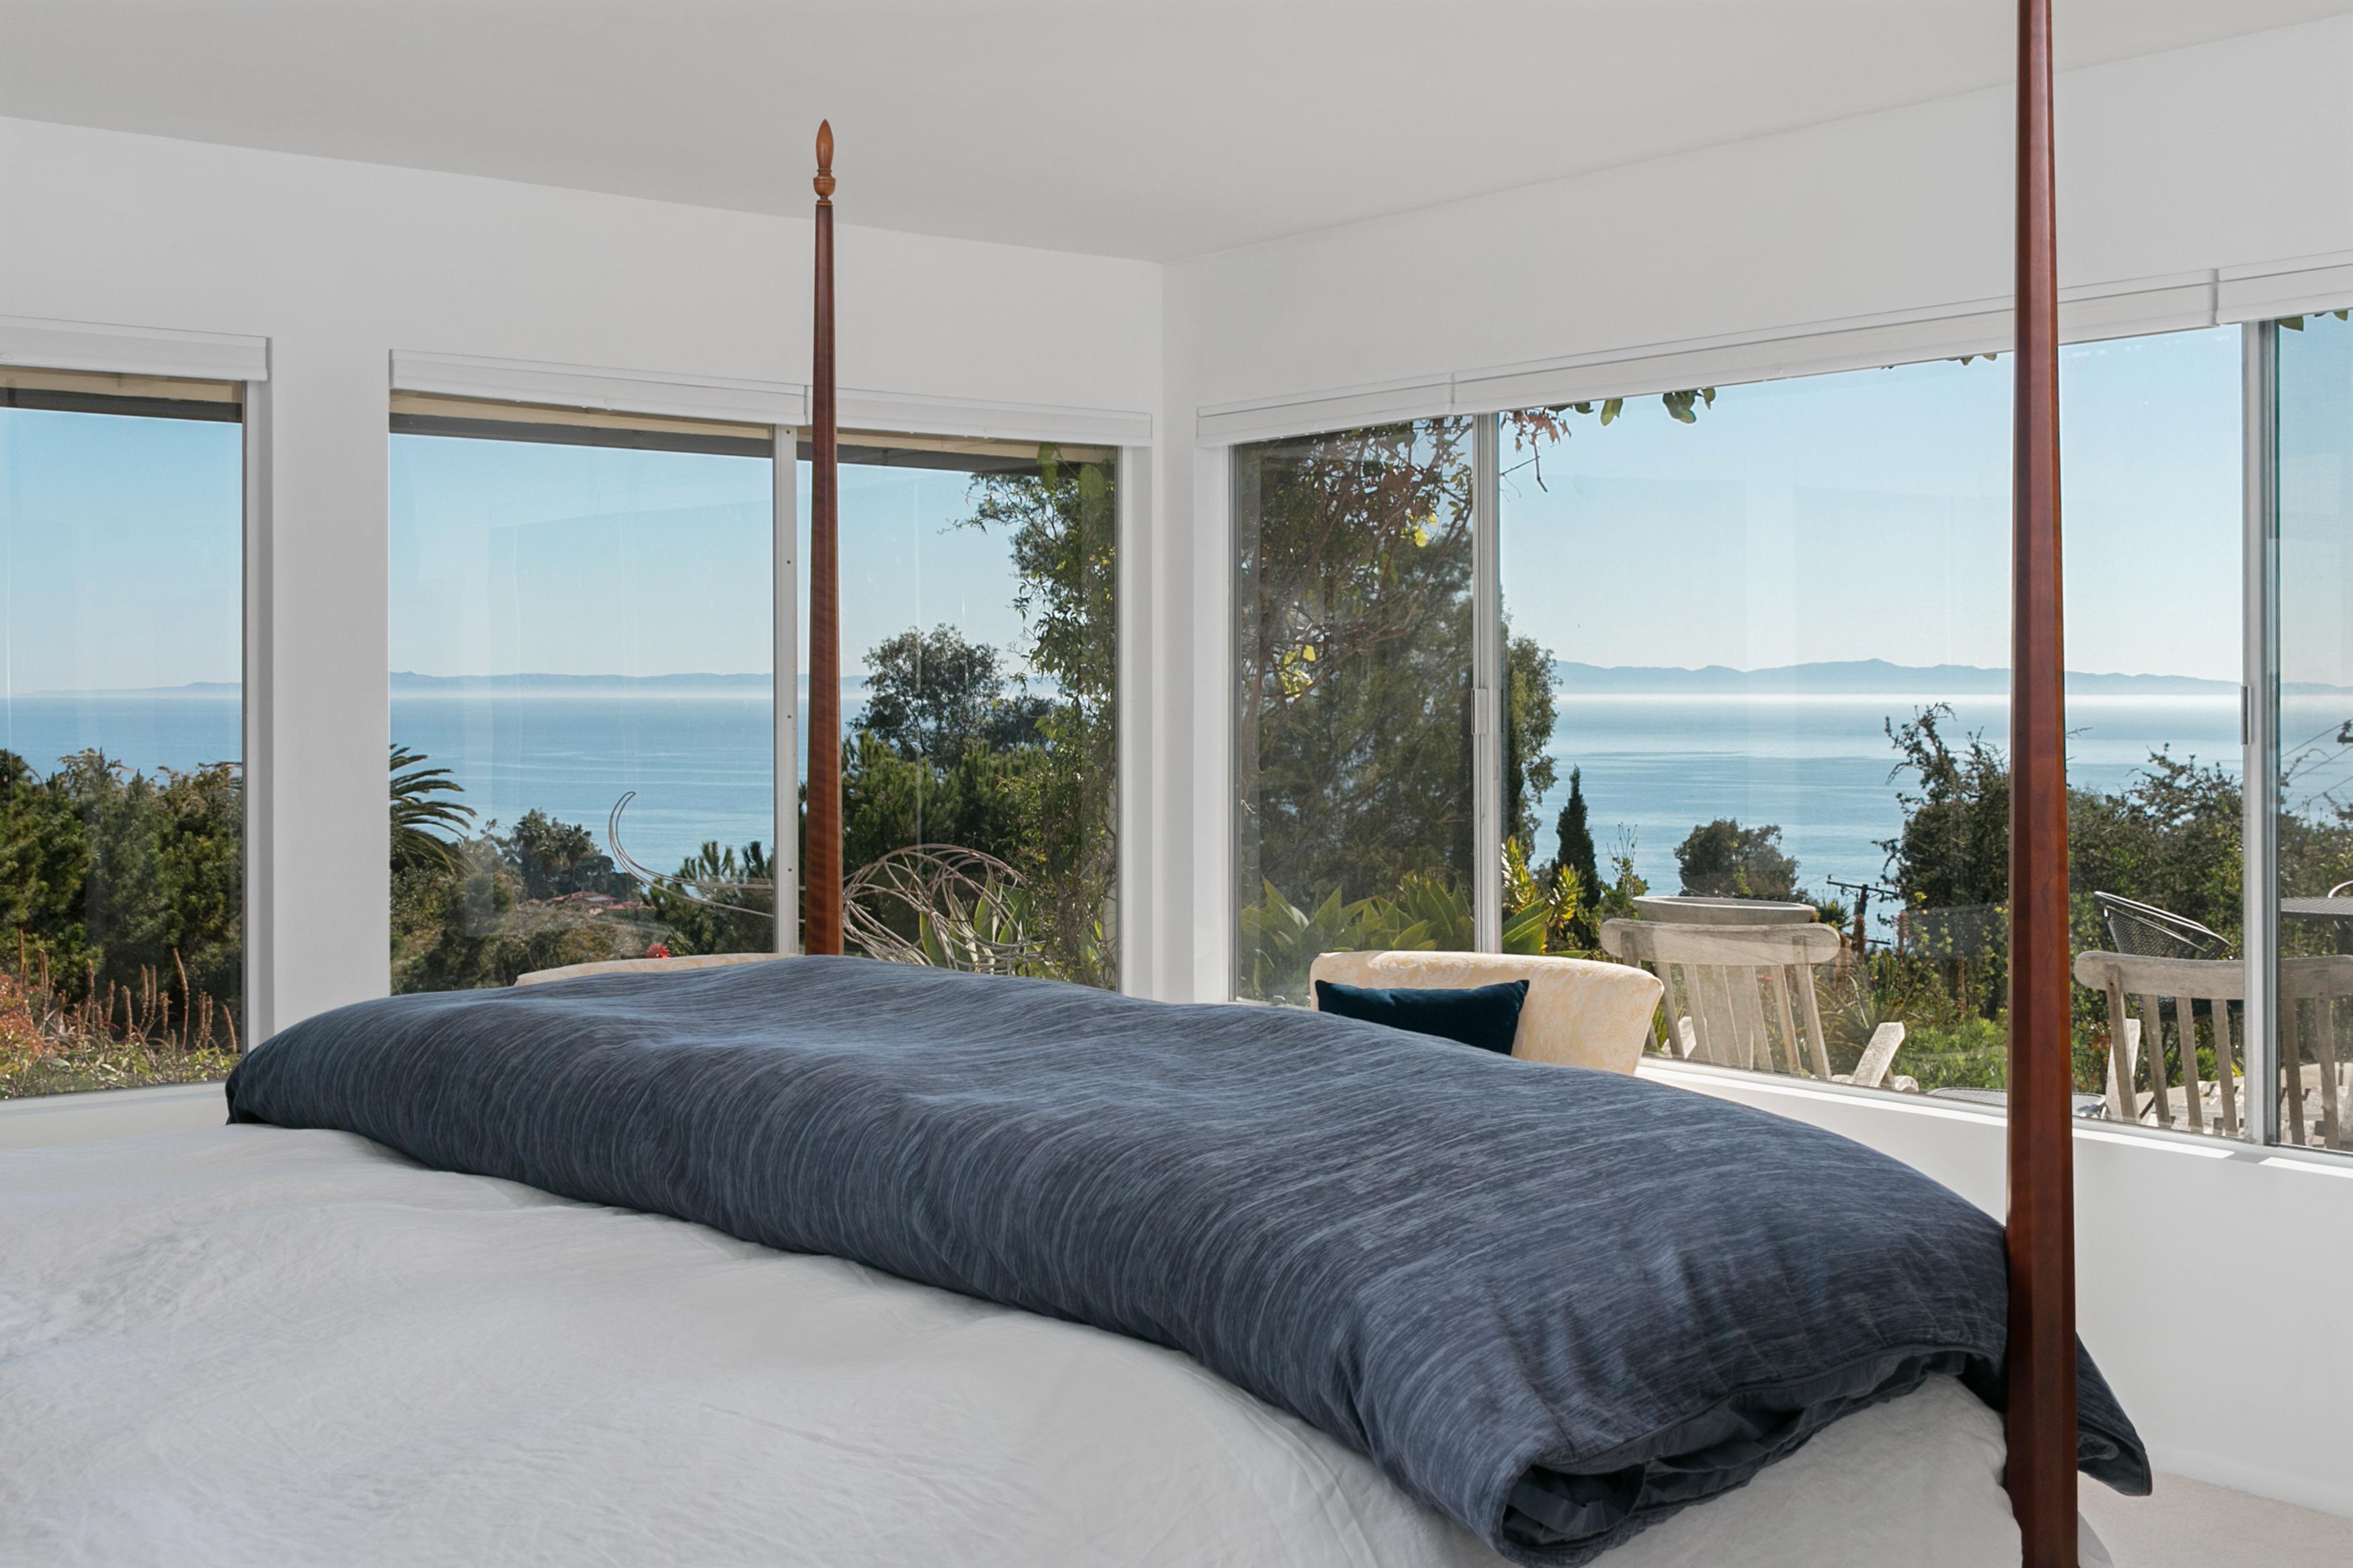 Santa Barbara CA Vacation Rental Welcome to your